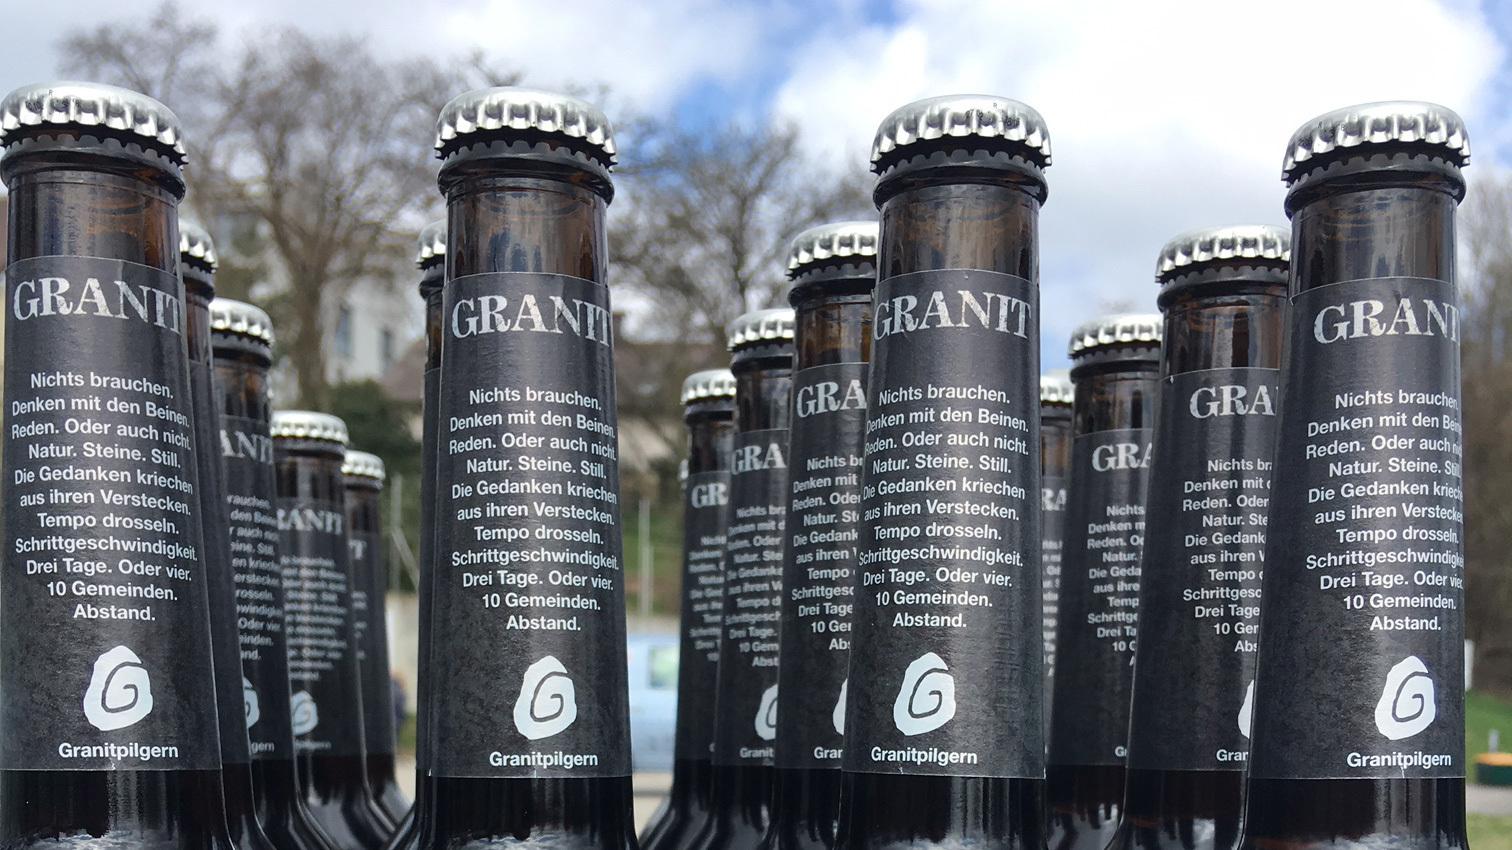 Ref Granit Bier